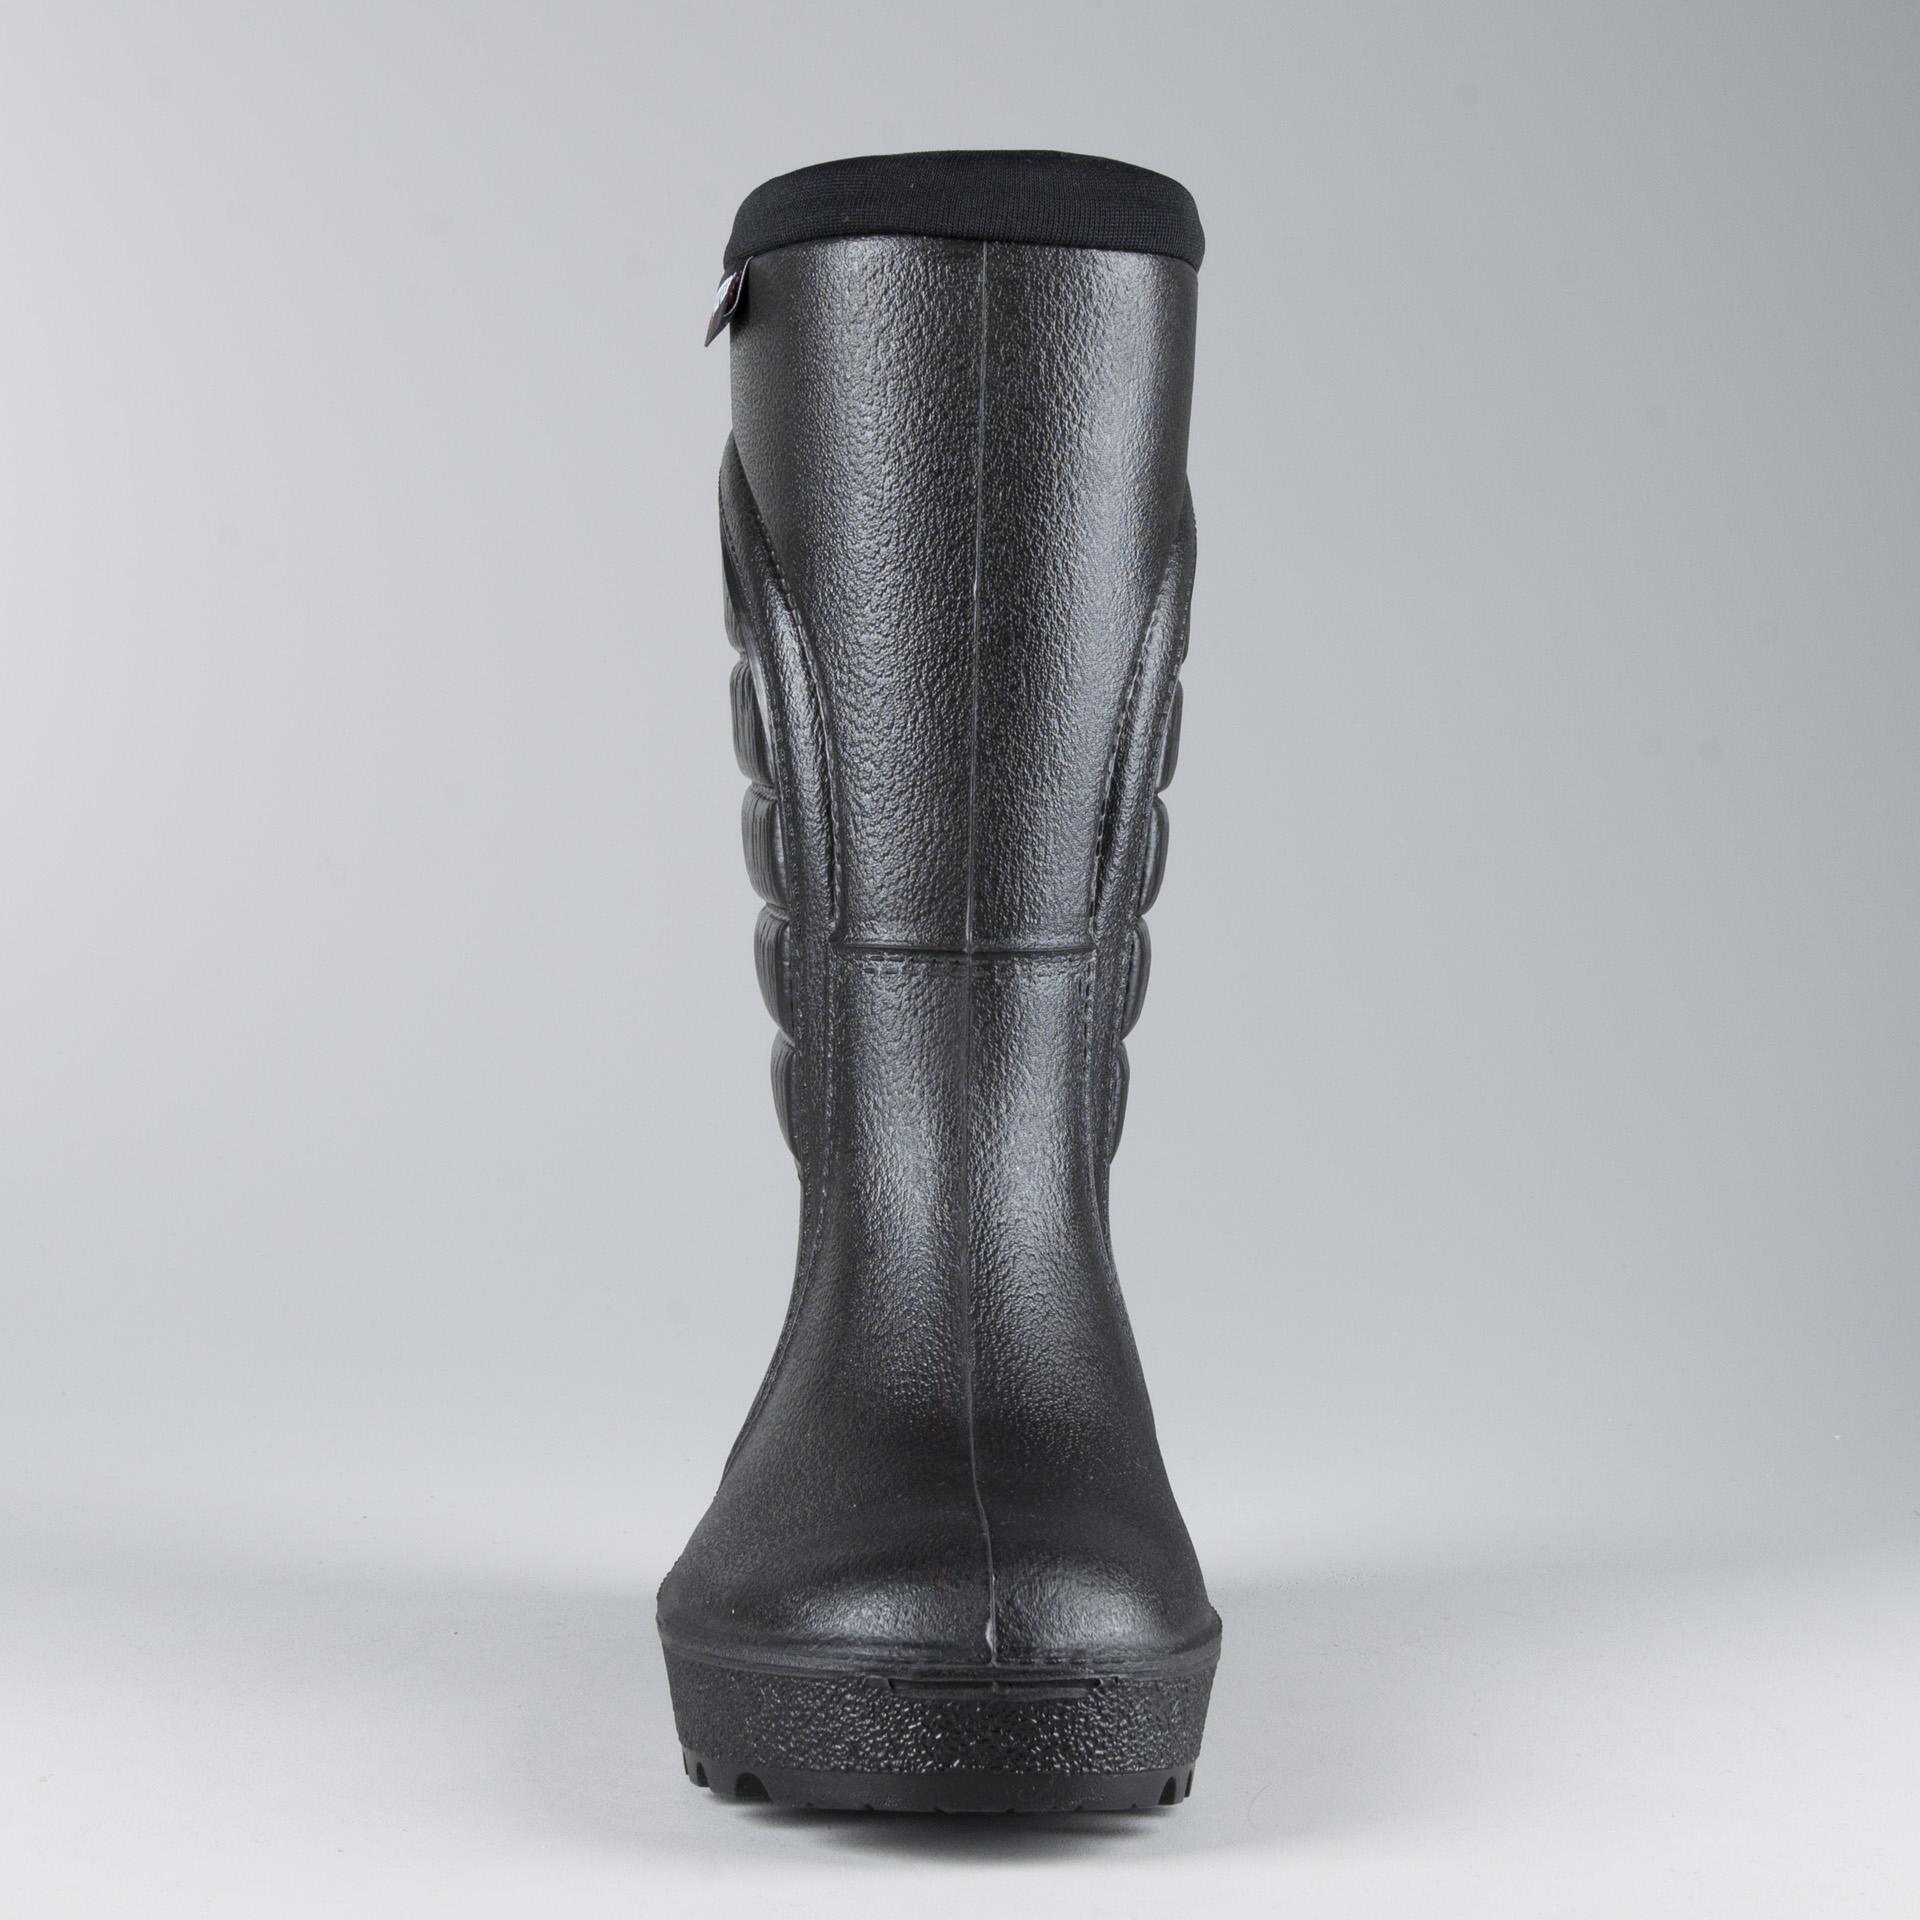 Polyver Premium Safety Boots Black